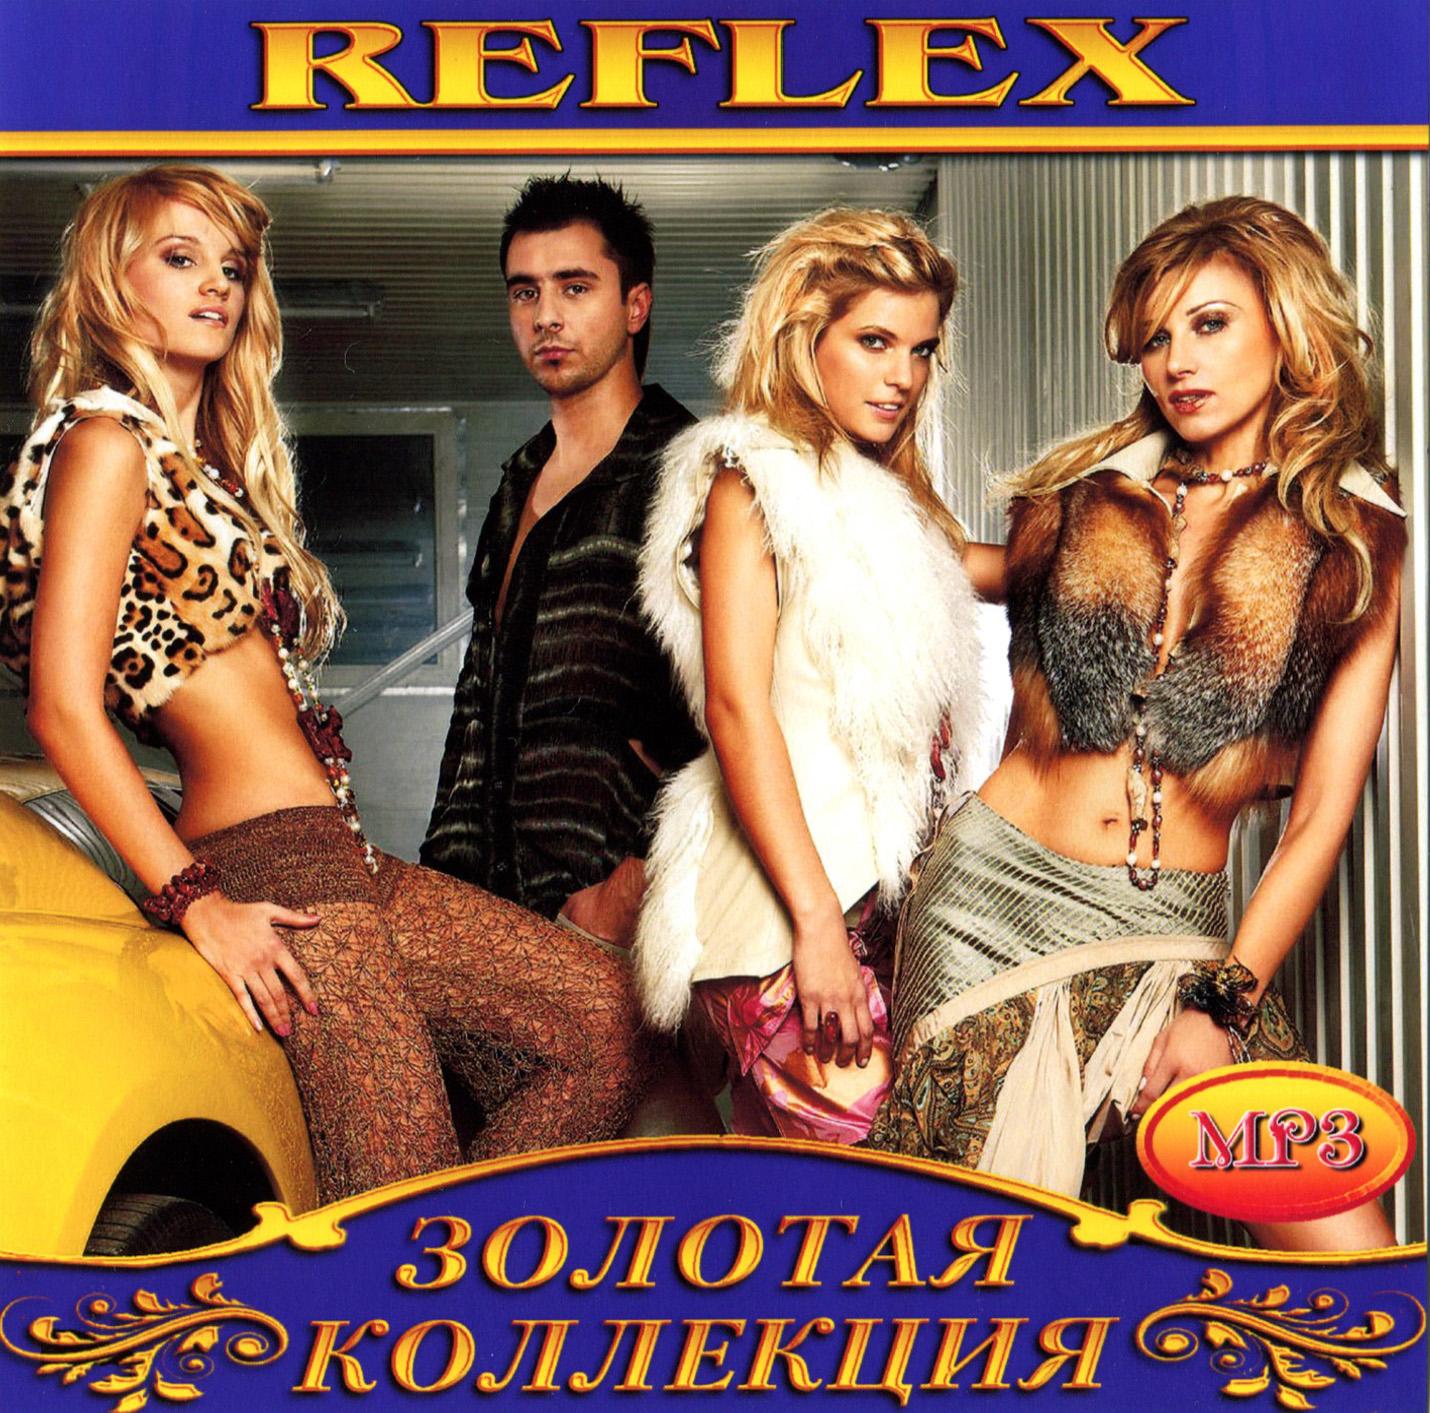 Reflex [mp3]